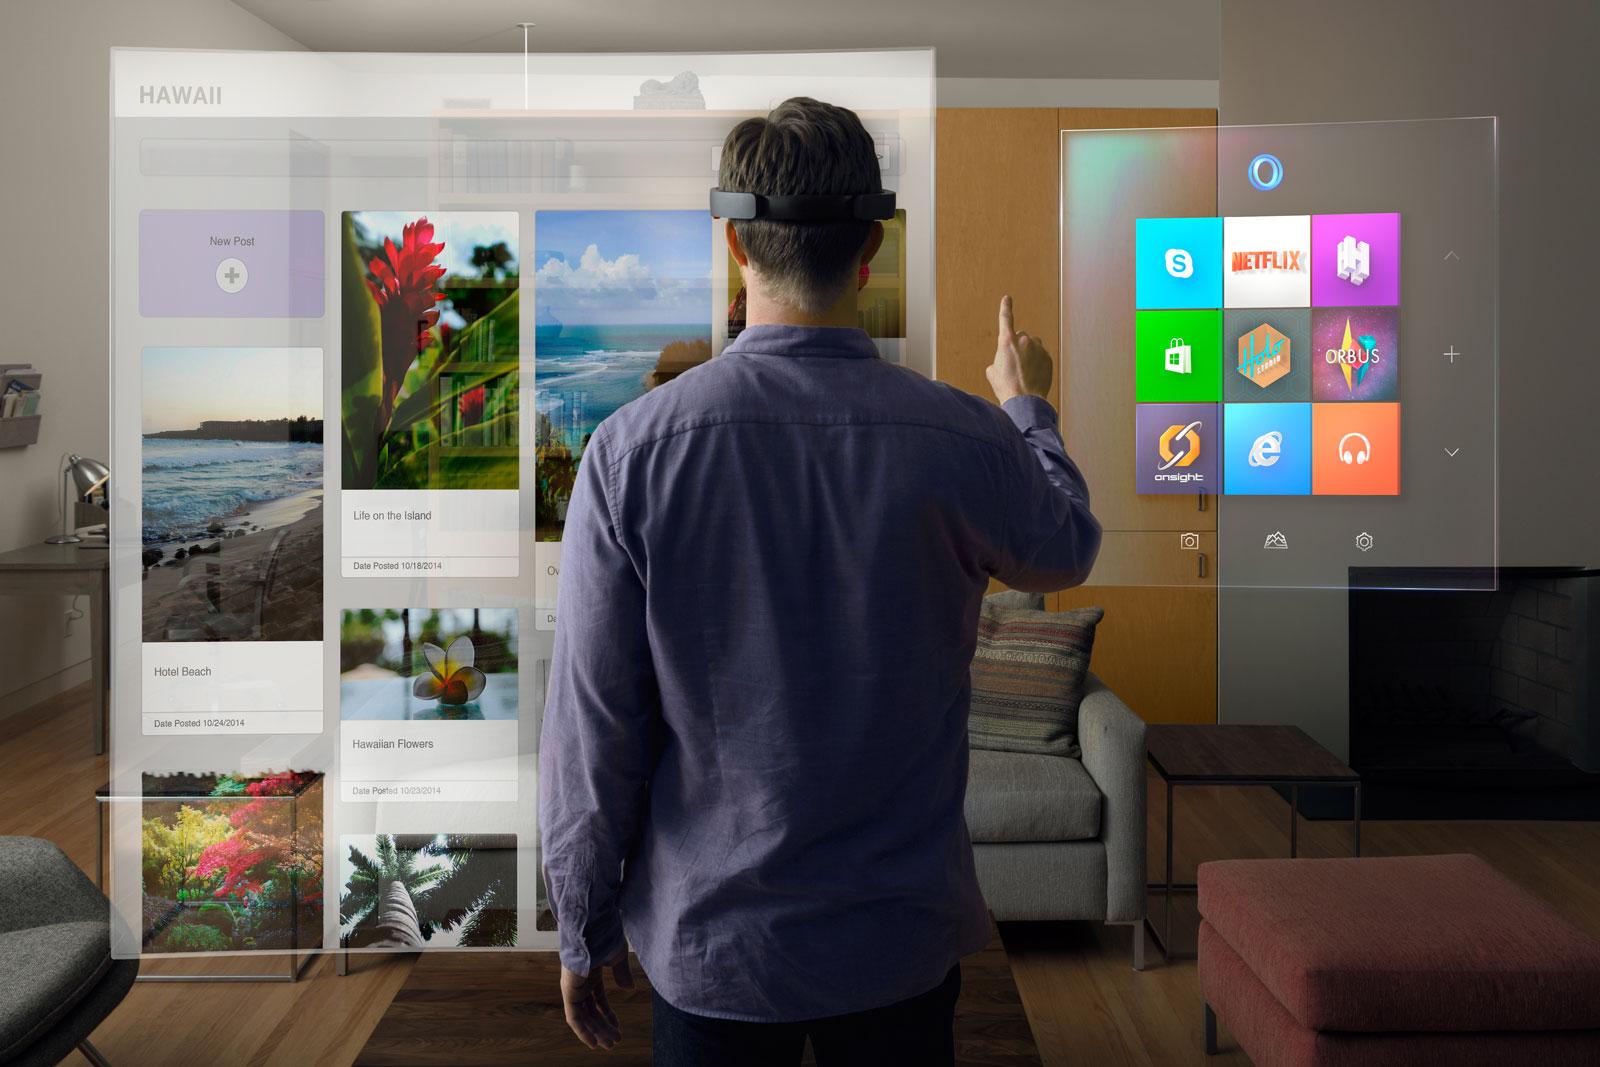 Un aperçu de l'expérience que promet l'HoloLens de Microsoft (Image : Microsoft).